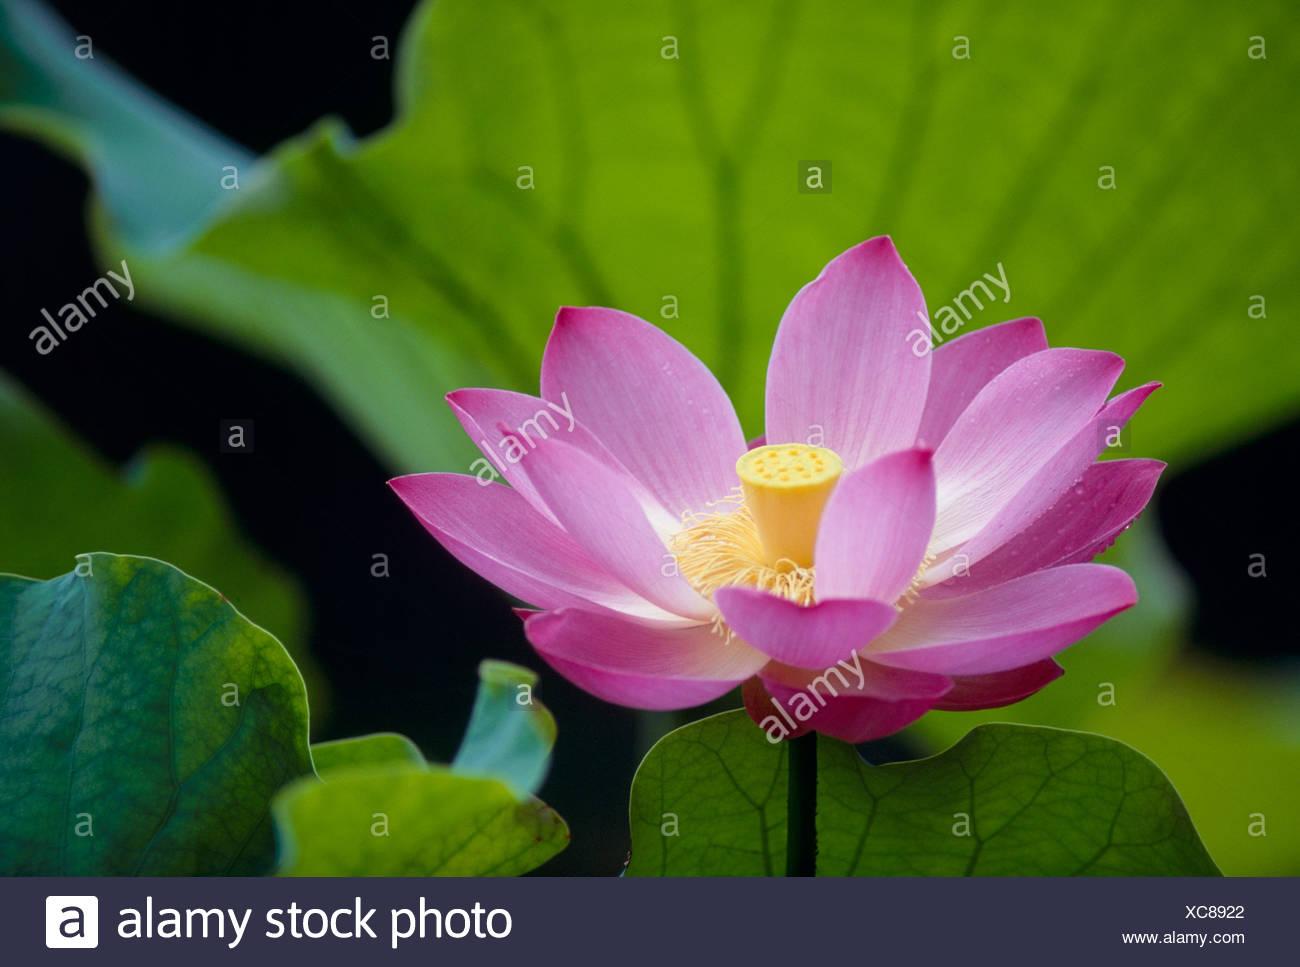 Lotus flower stock photo 282924490 alamy lotus flower izmirmasajfo